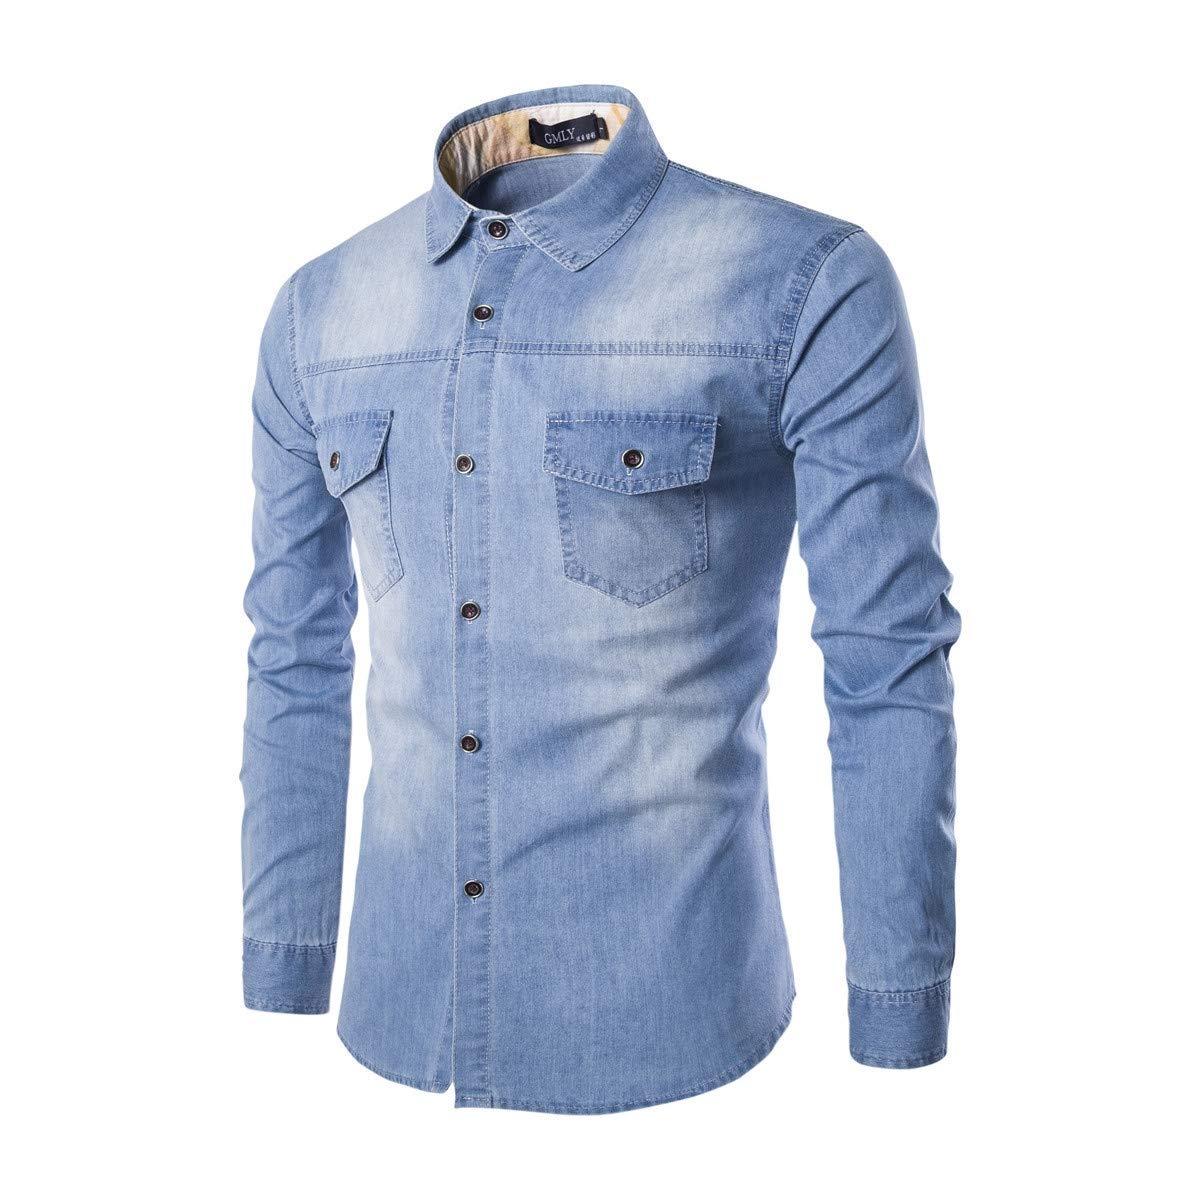 Abetteric Mens Pocket Office Plus Size Denim Washed Business Shirts